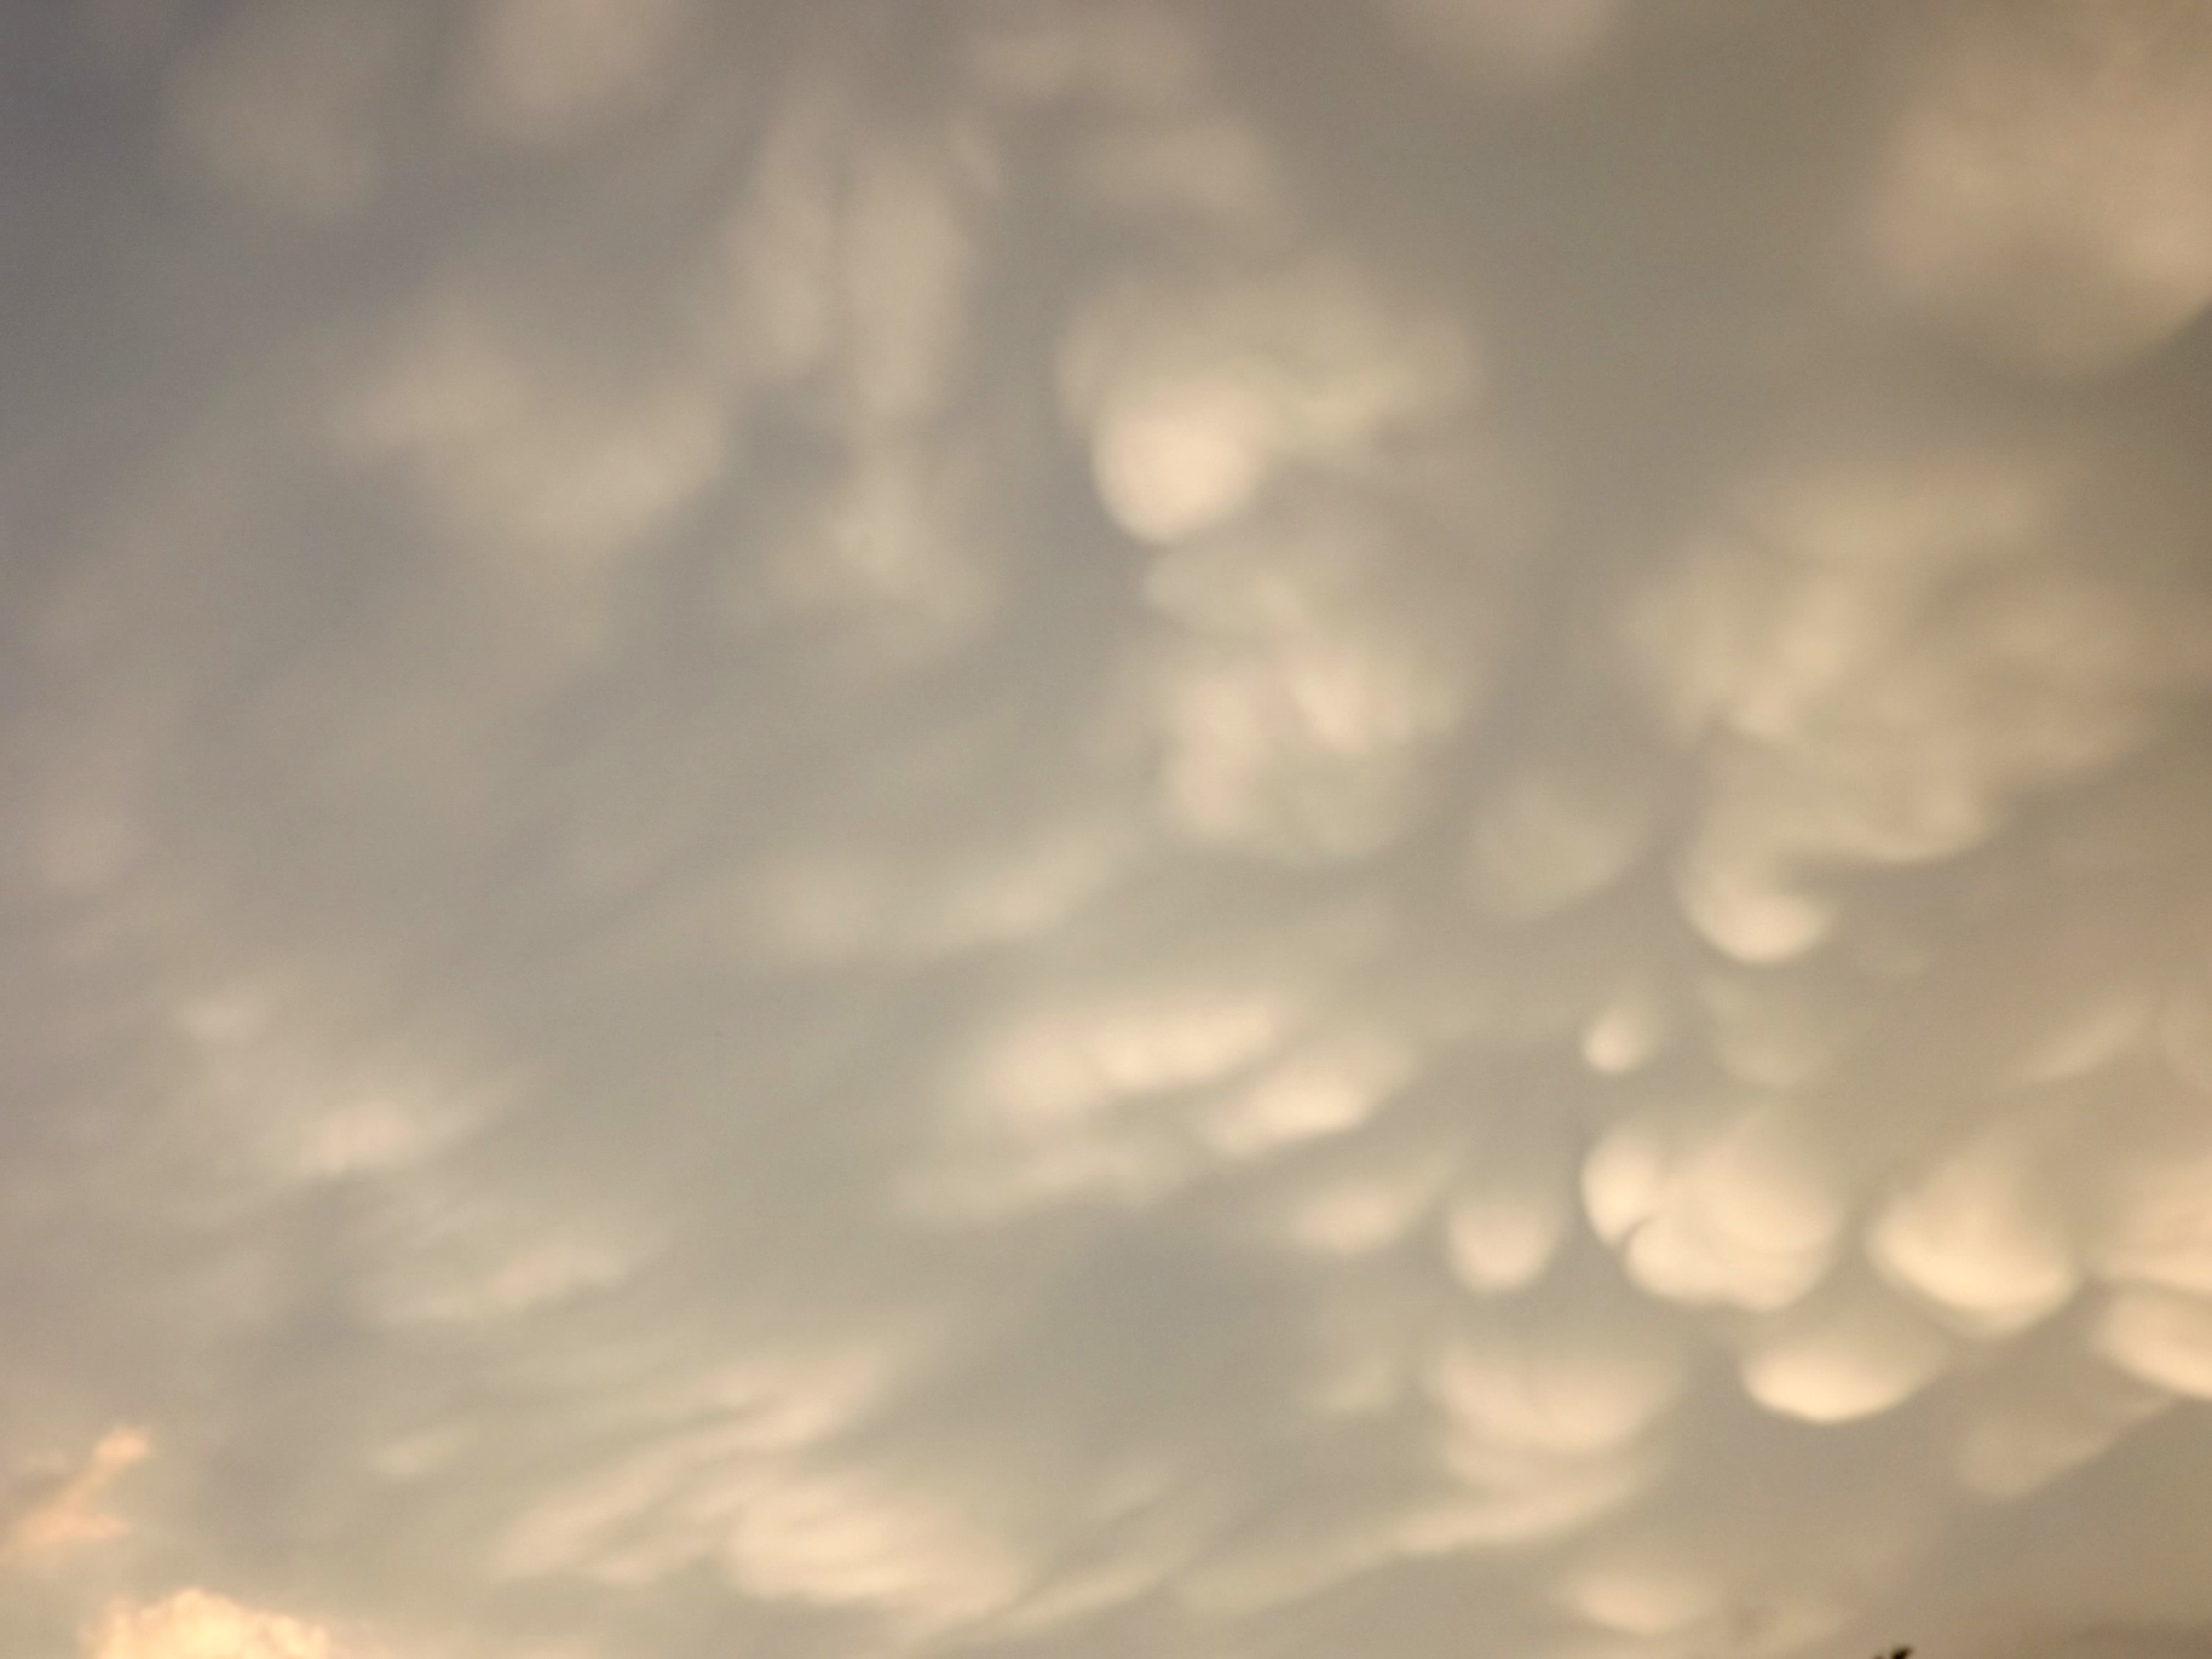 6249-himmel-wolken-zuckerwatte